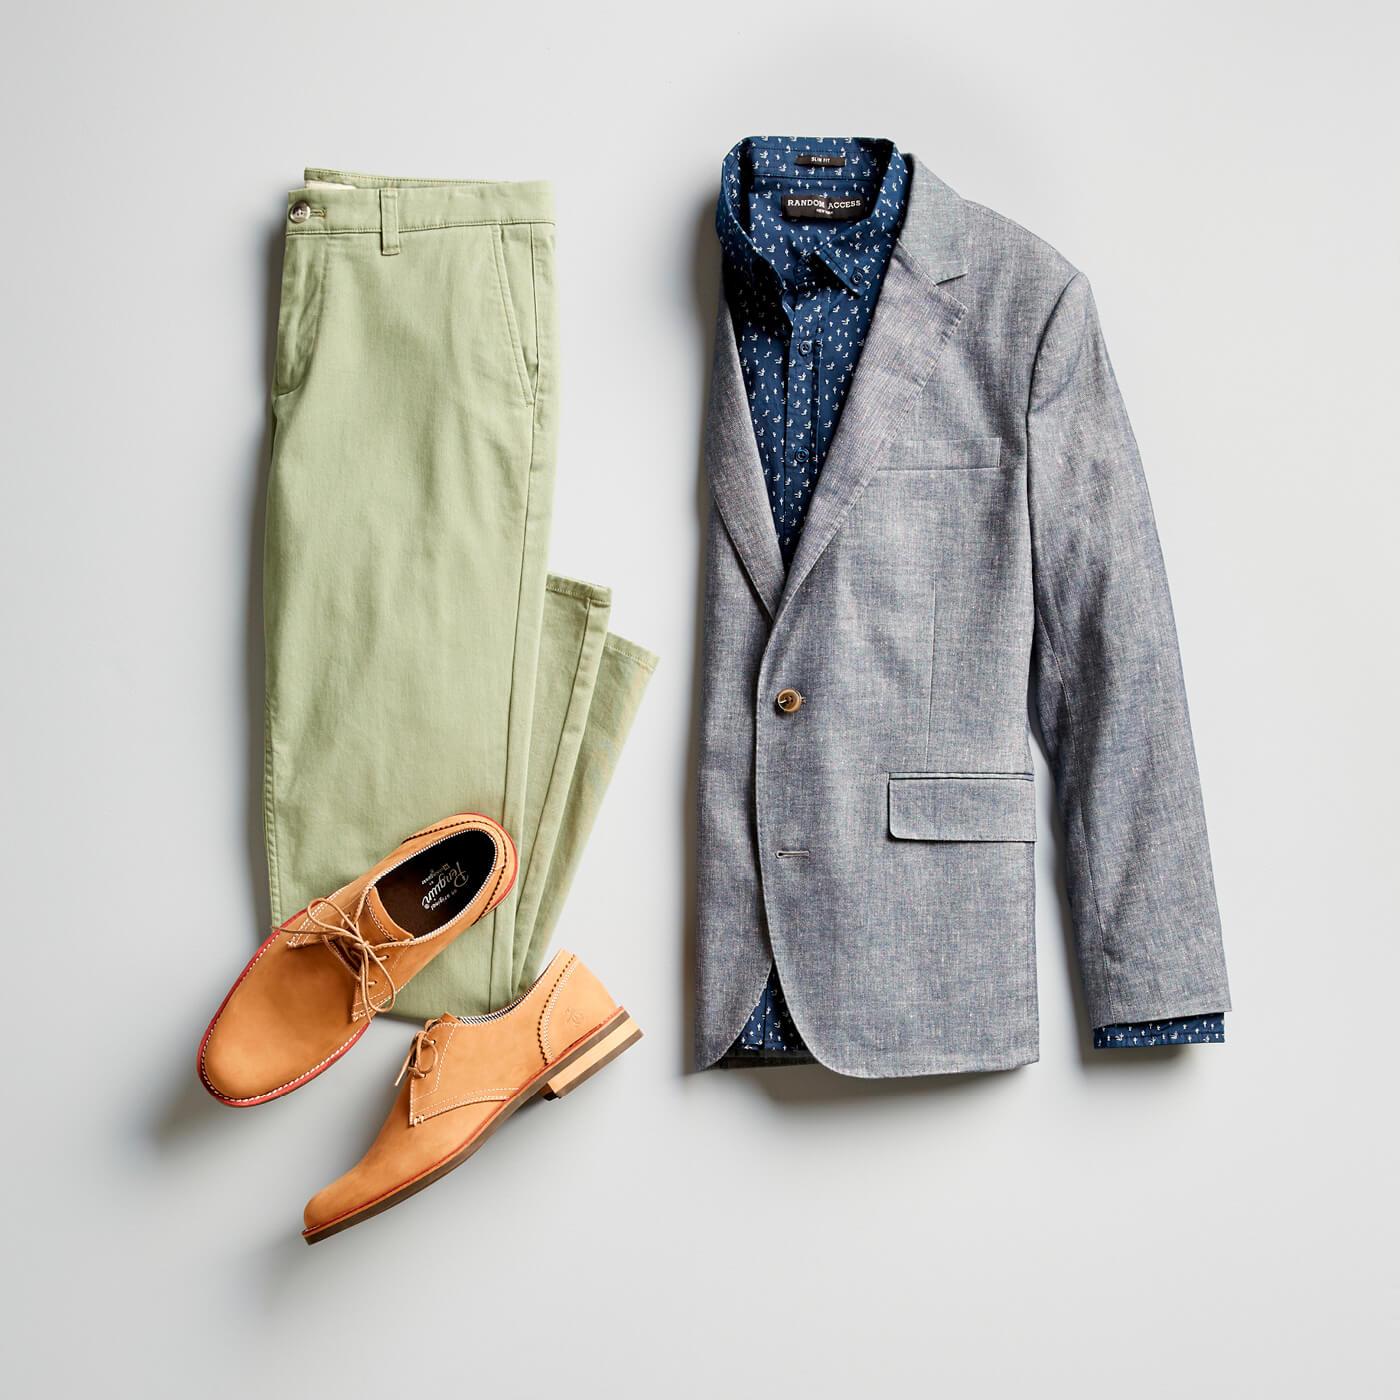 green chinos and grey blazer